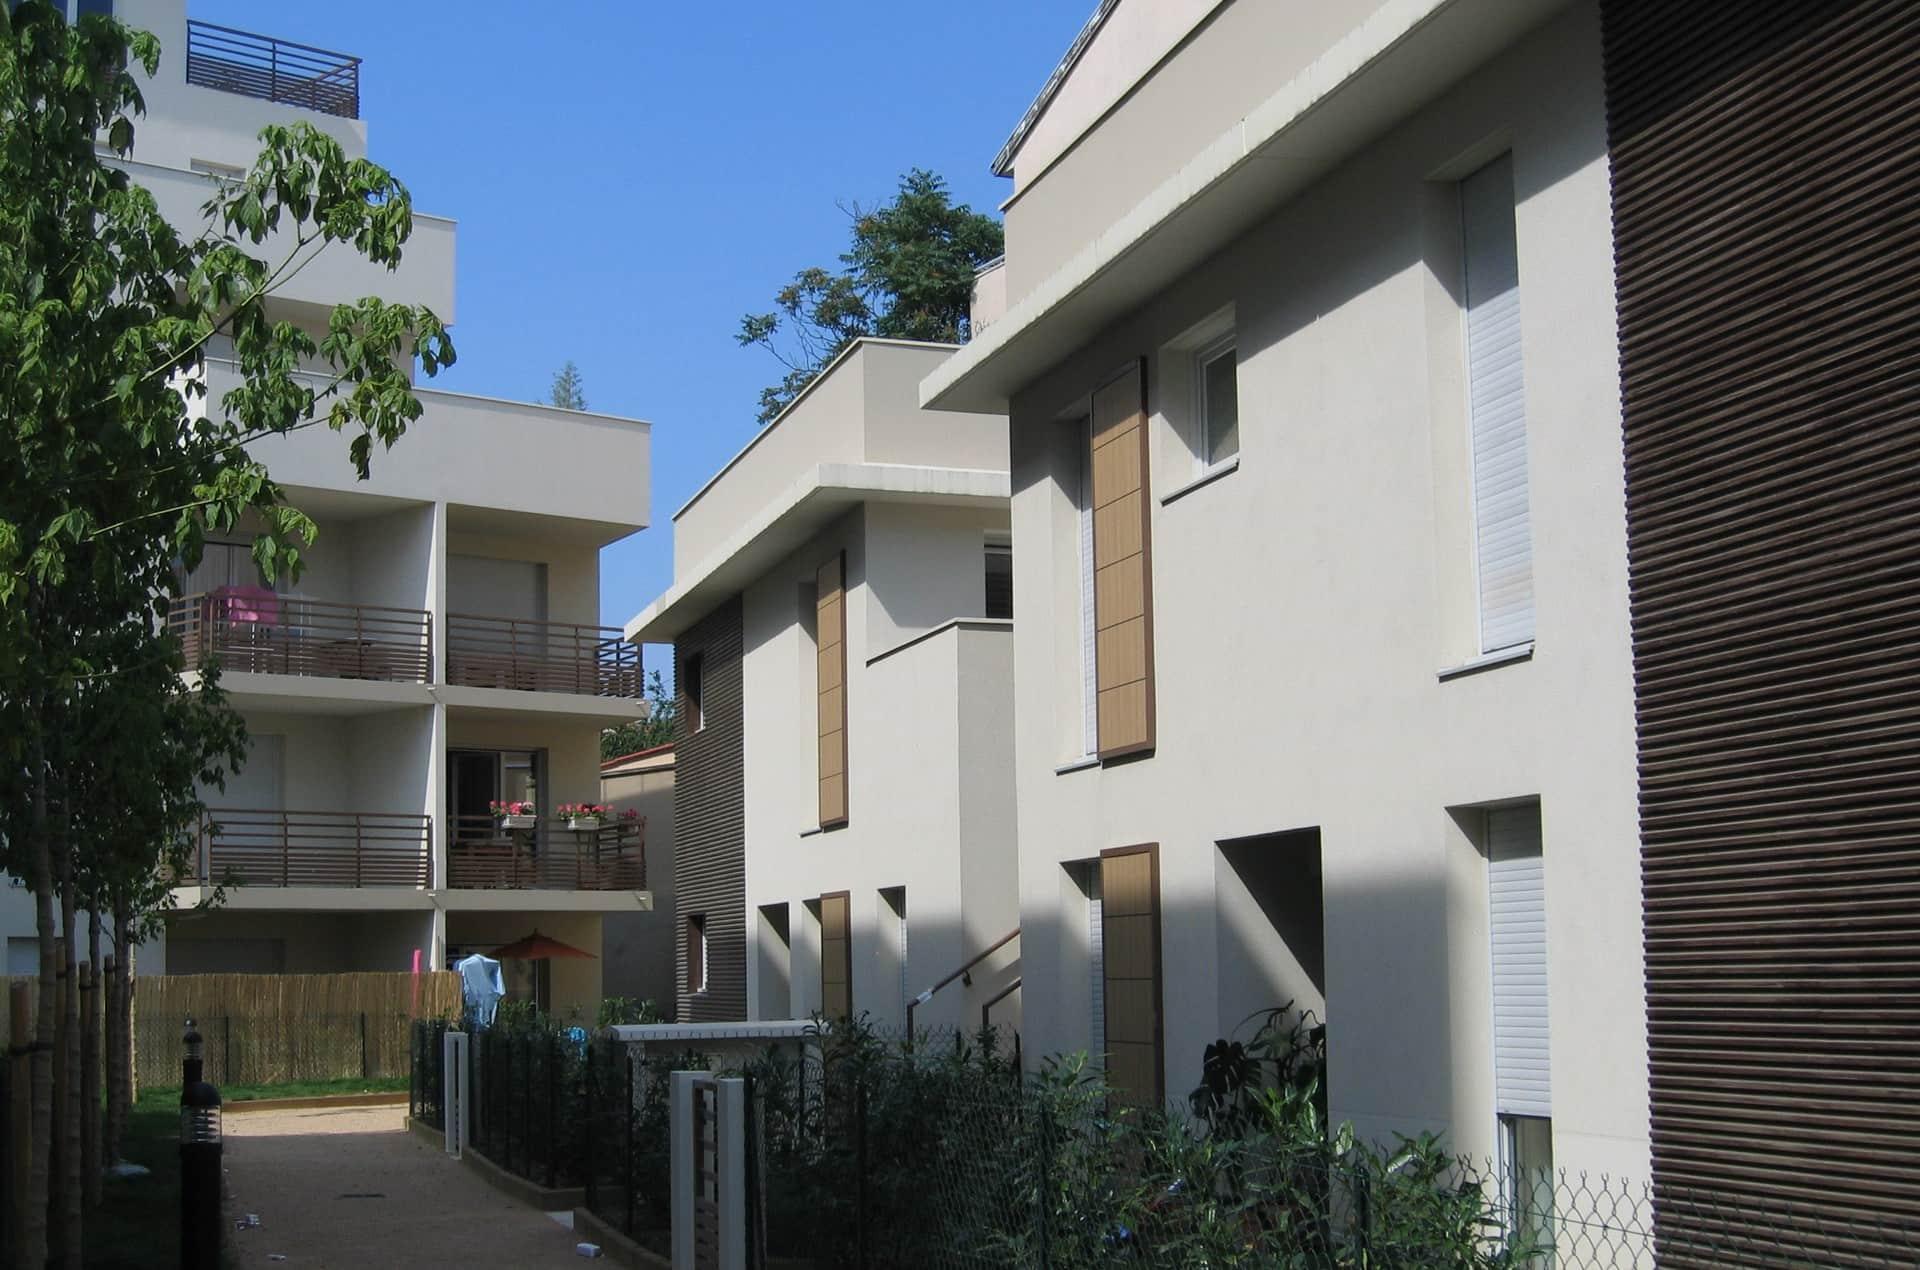 architec-domremy-vue-dehors-logements